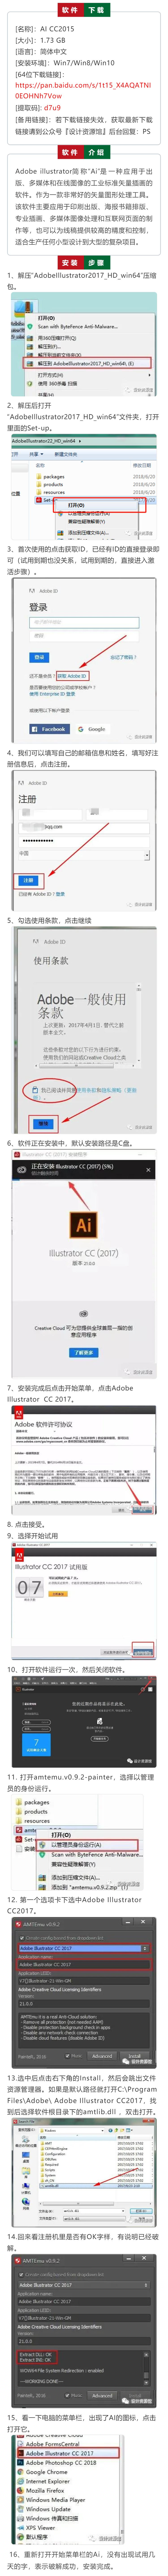 Adobe Illustrator CC 2015安装包及教程